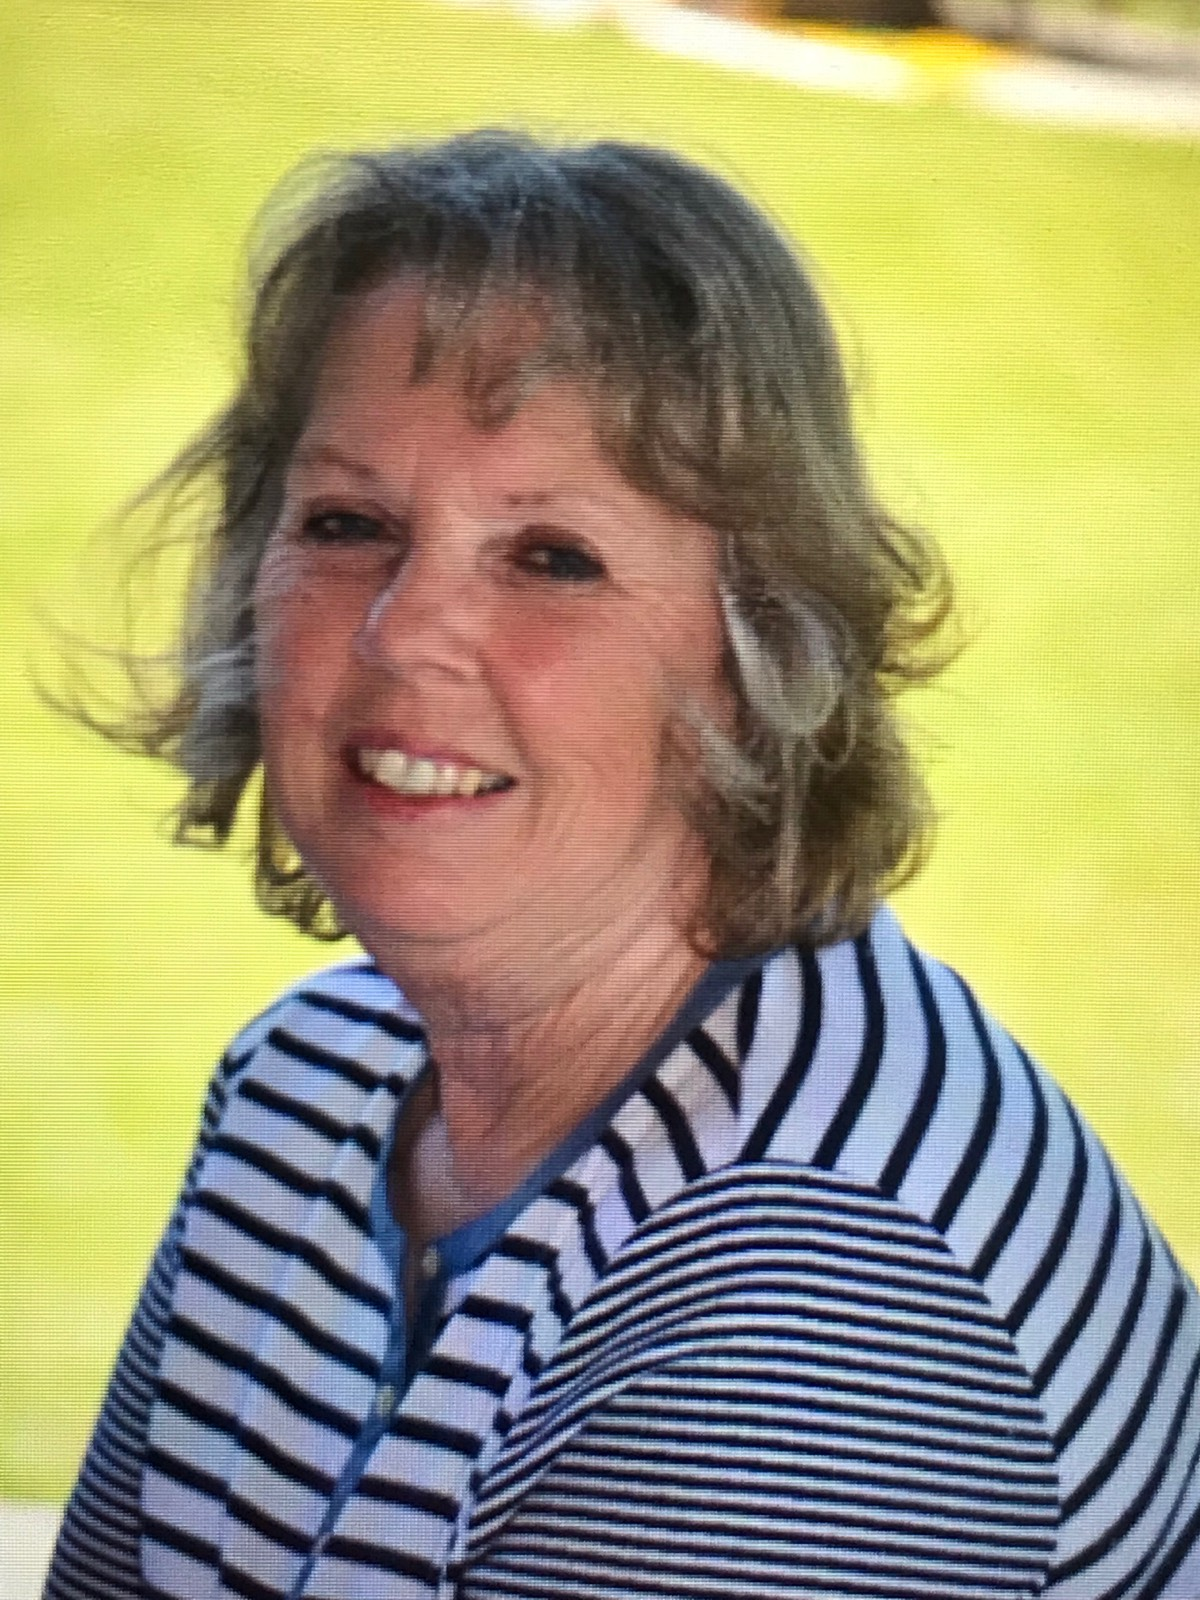 Connie Soule, 67, Harrisburg